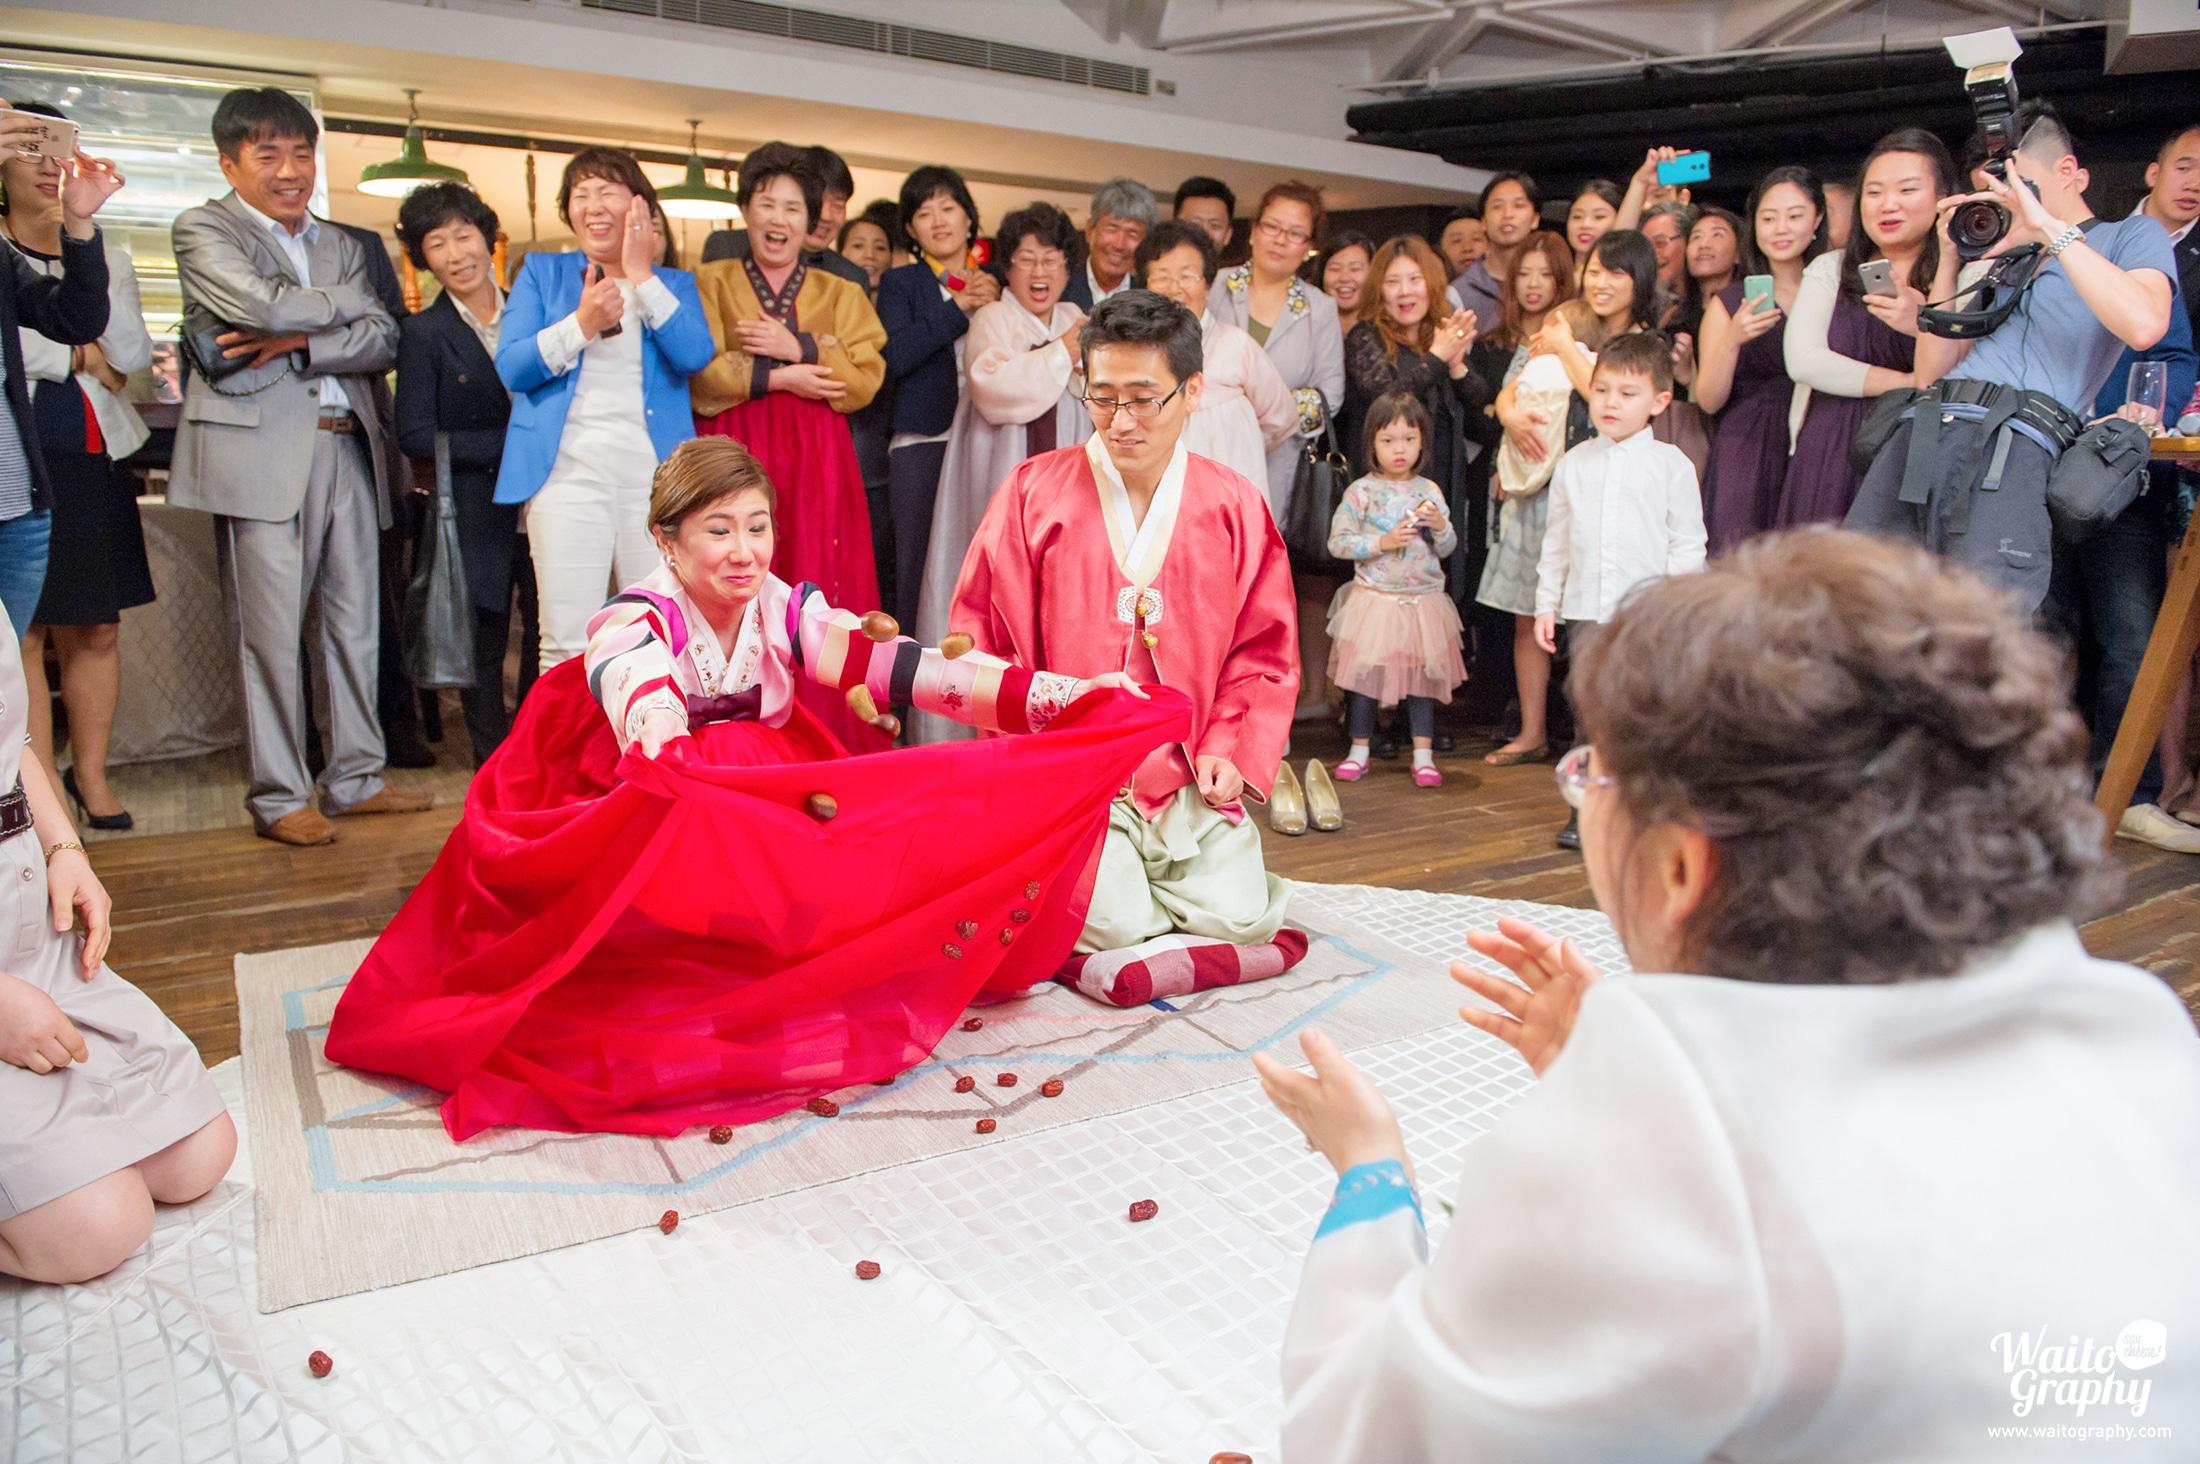 Mary & Heewoo Korean Wedding Day HK Assaggio Trattoria Italiana